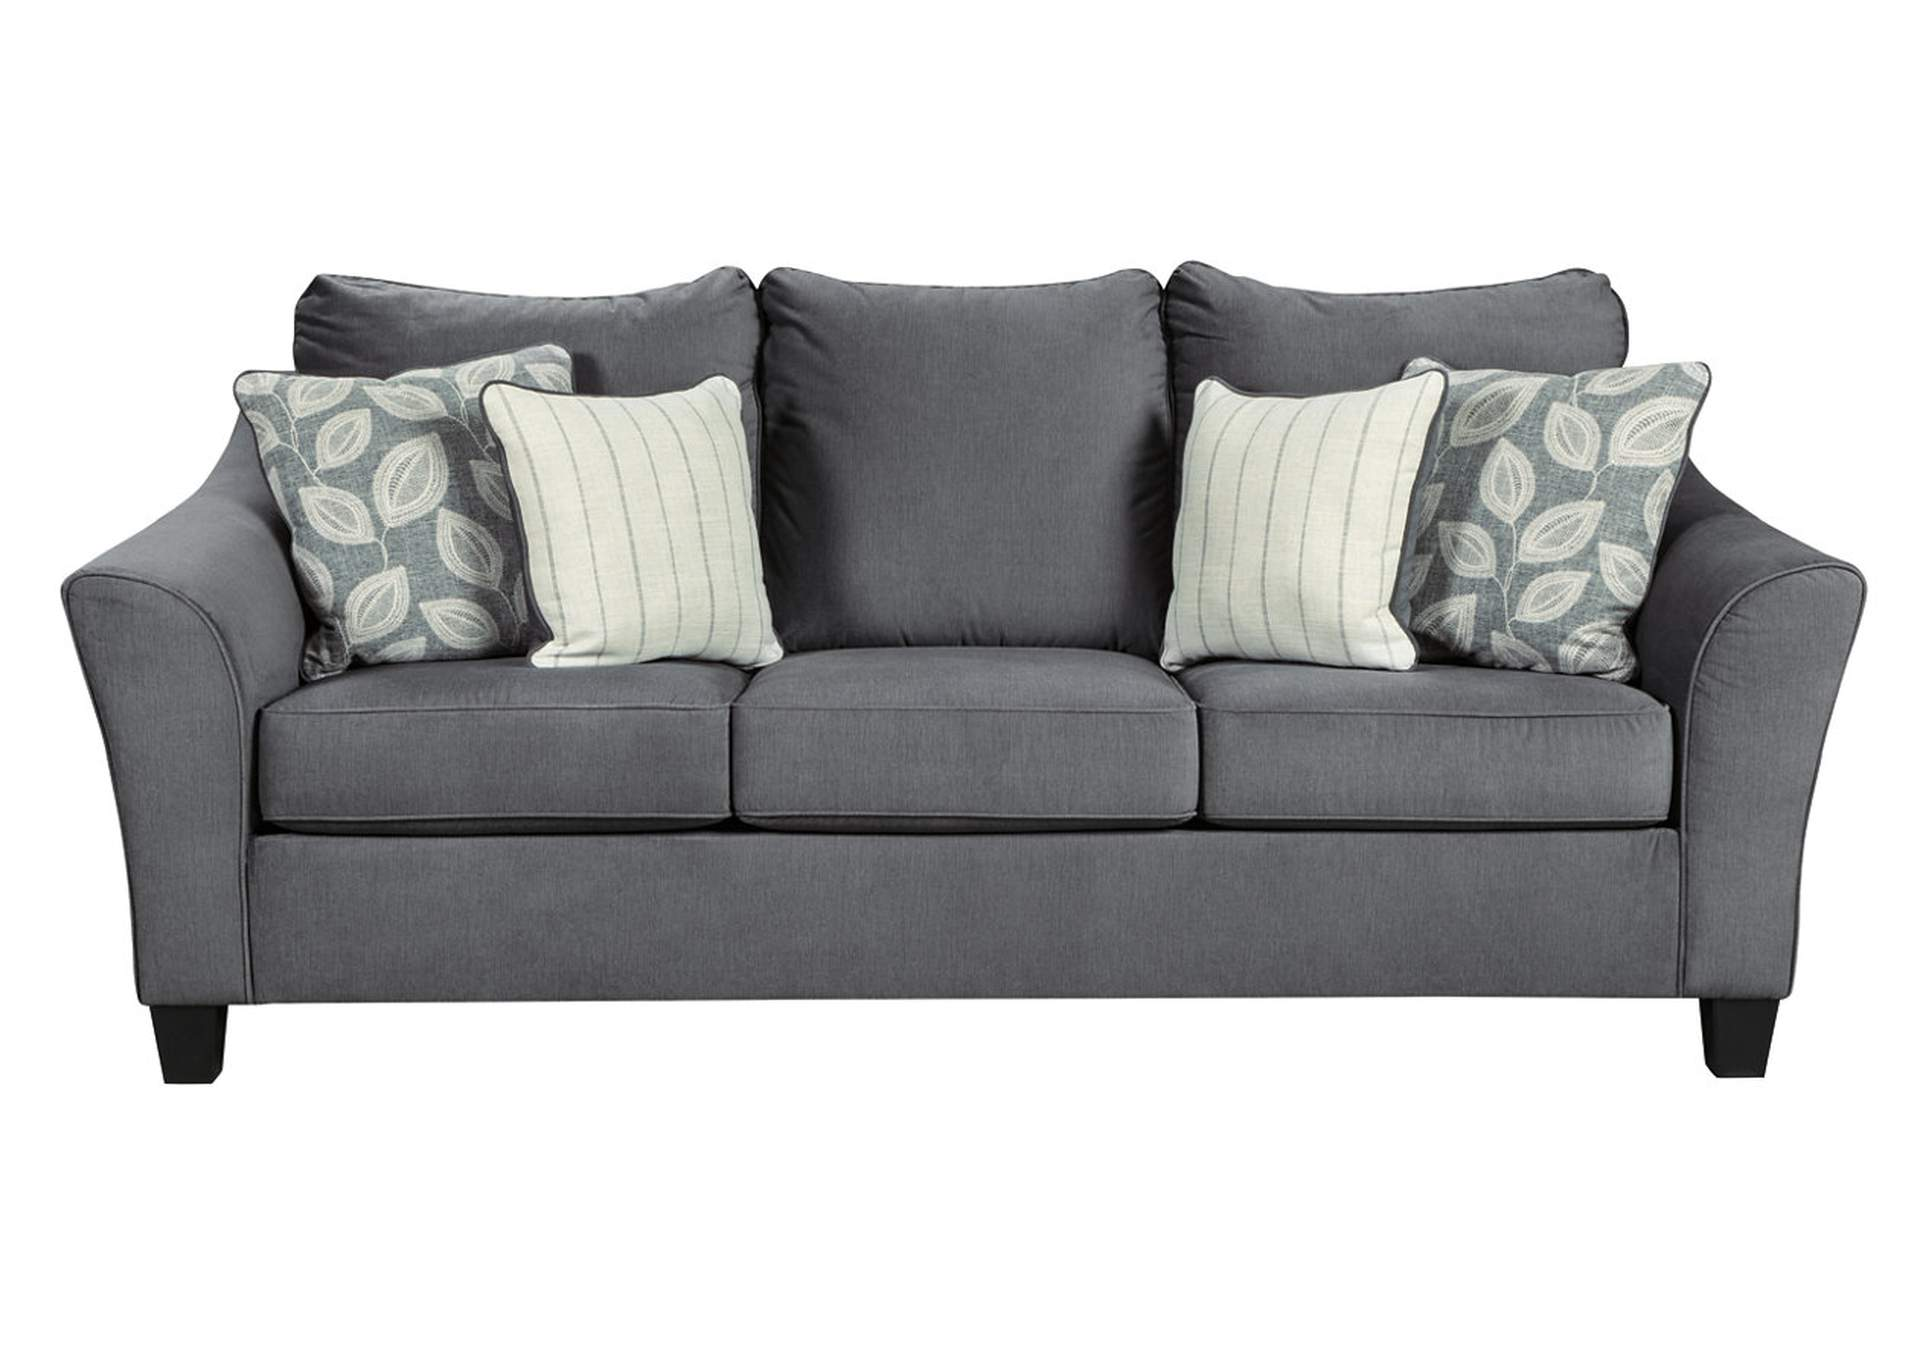 Roberts Furniture & Mattress Sanzero Gray Queen Sofa Sleeper